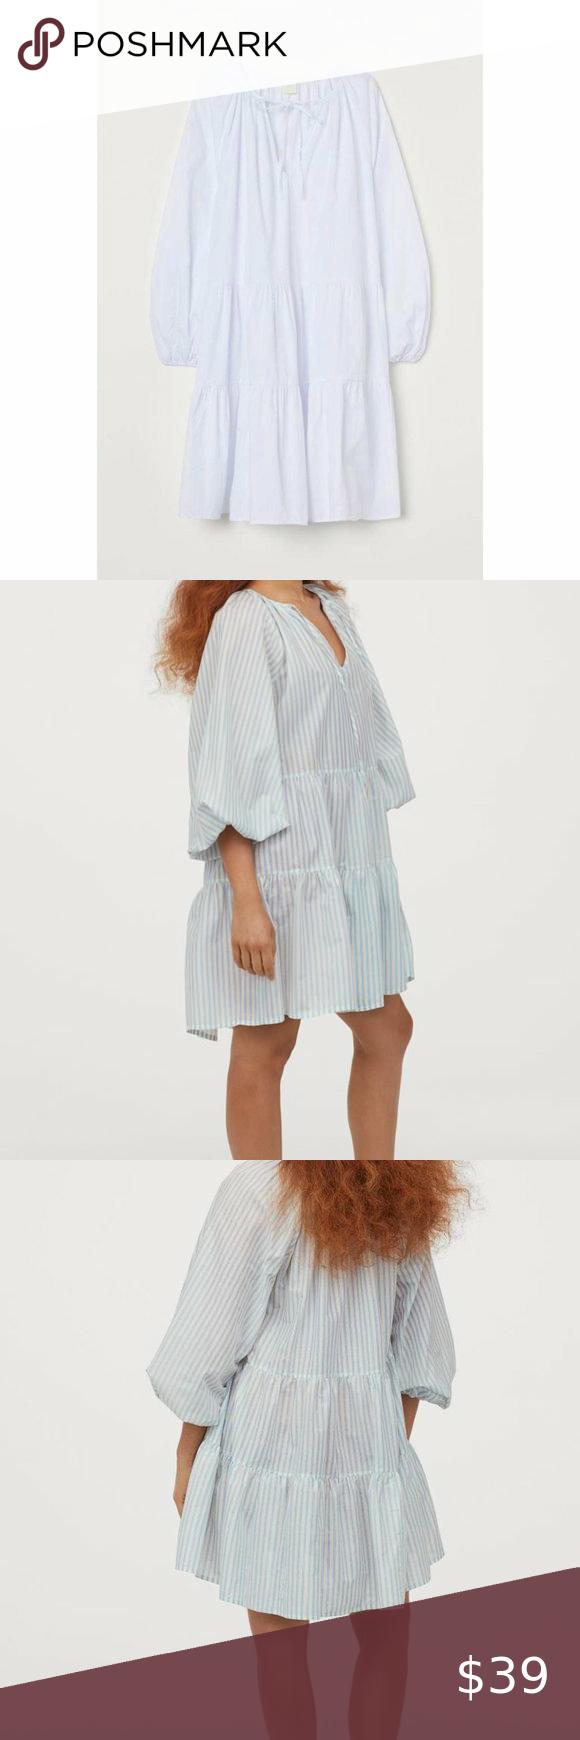 H M Puff Sleeve Tiered Mini Dress White S White Mini Dress Mini Dress Puff Sleeve [ 1740 x 580 Pixel ]